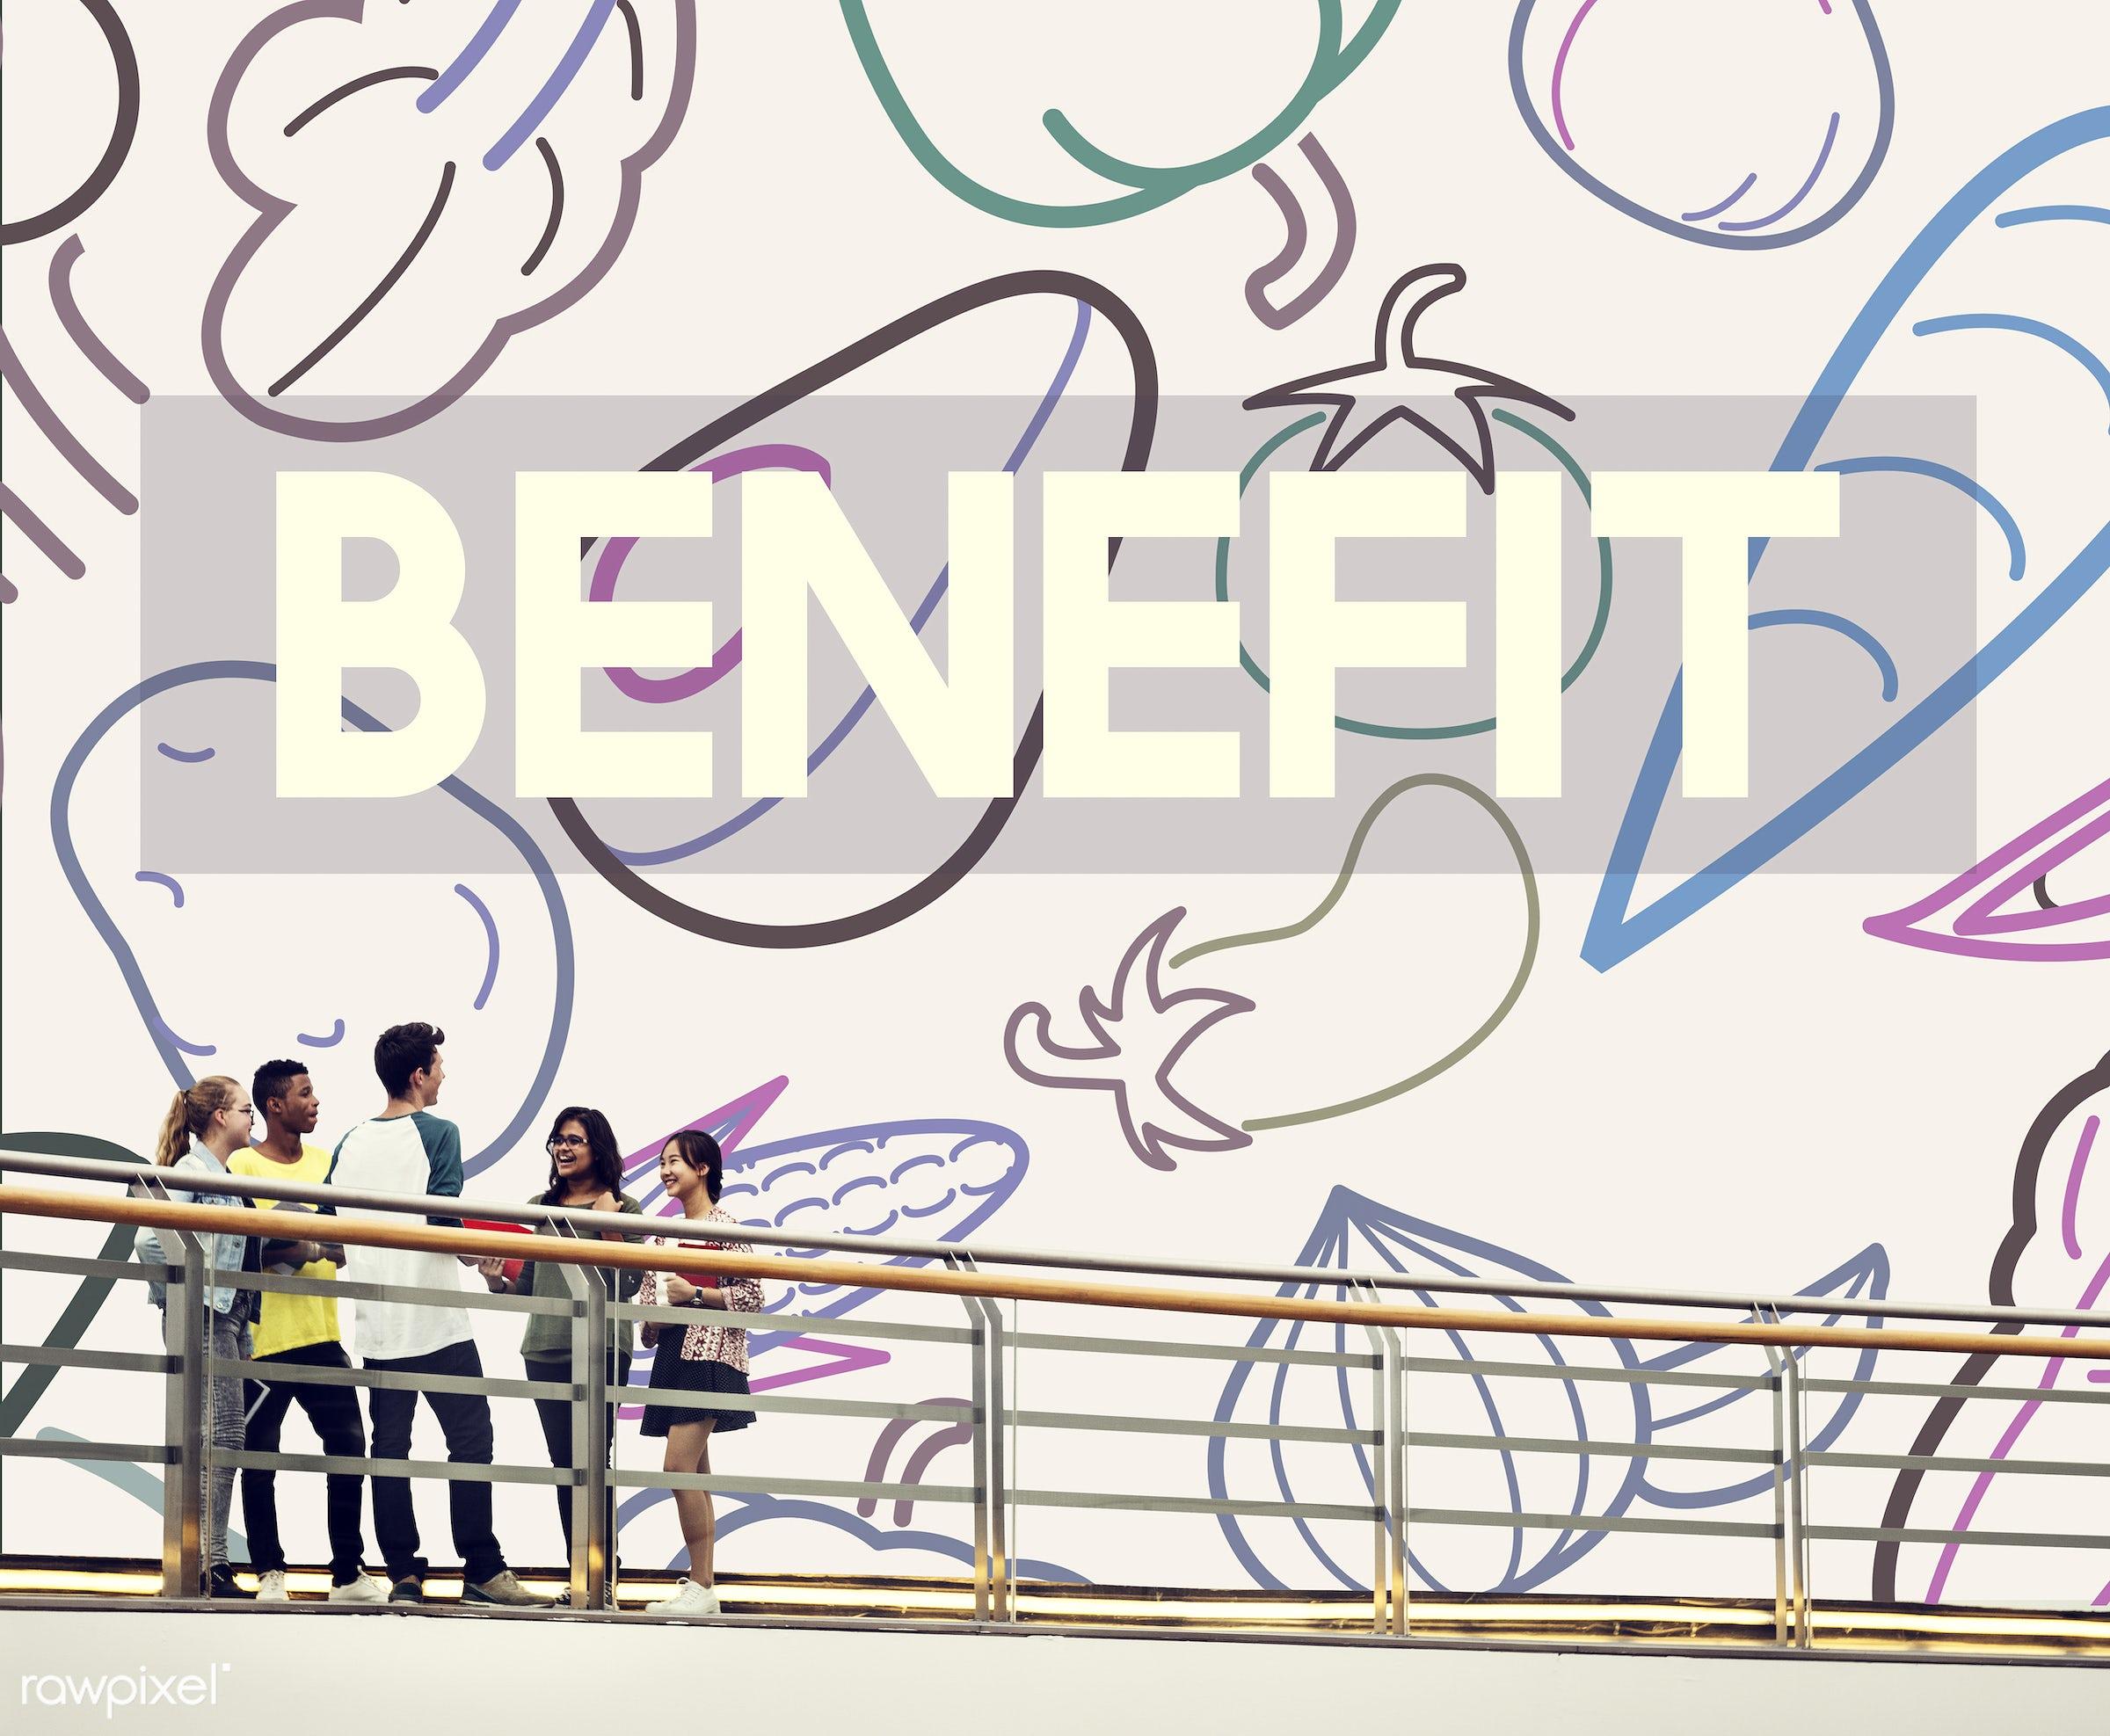 benefit, book, books, boy, bridge, business, carrying, communication, connection, control, data, database, digital, friends...